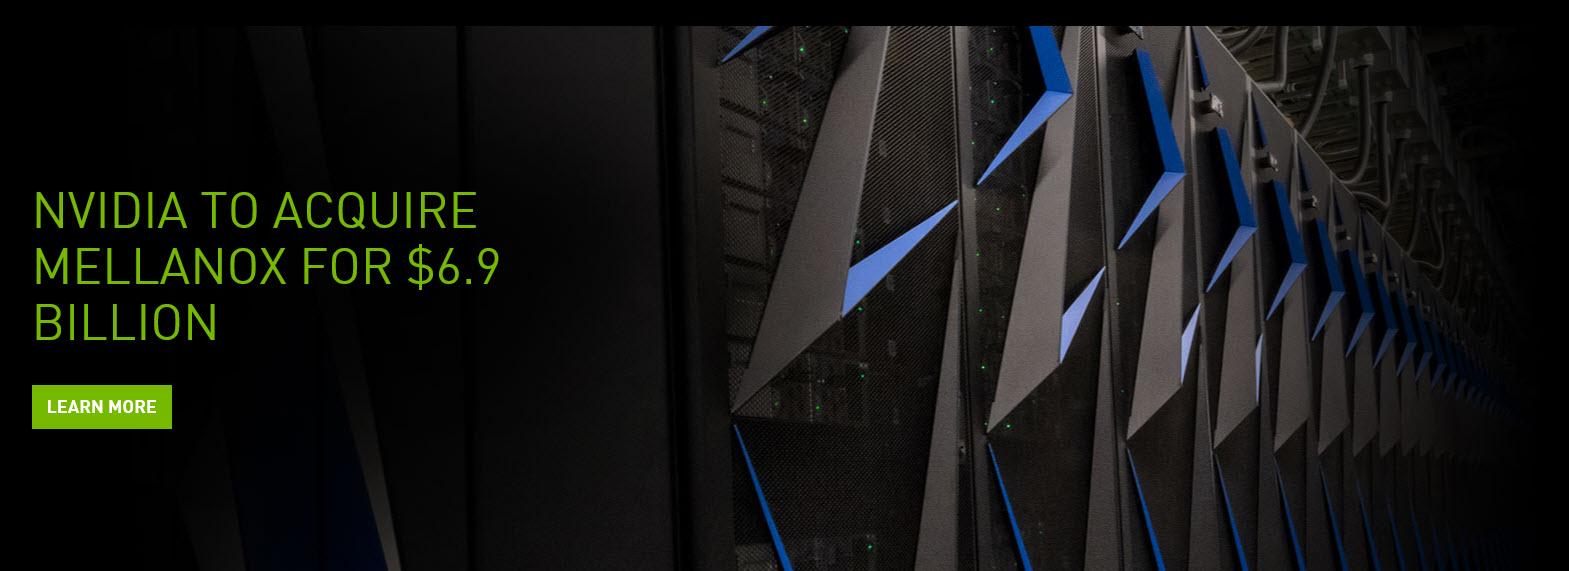 2019 03 13 7 37 38 NVIDIA ซื้อหุ้นทั้งหมดของ Mellanox รวมประมาณ 6.9 พันล้านเหรียญสหรัฐ